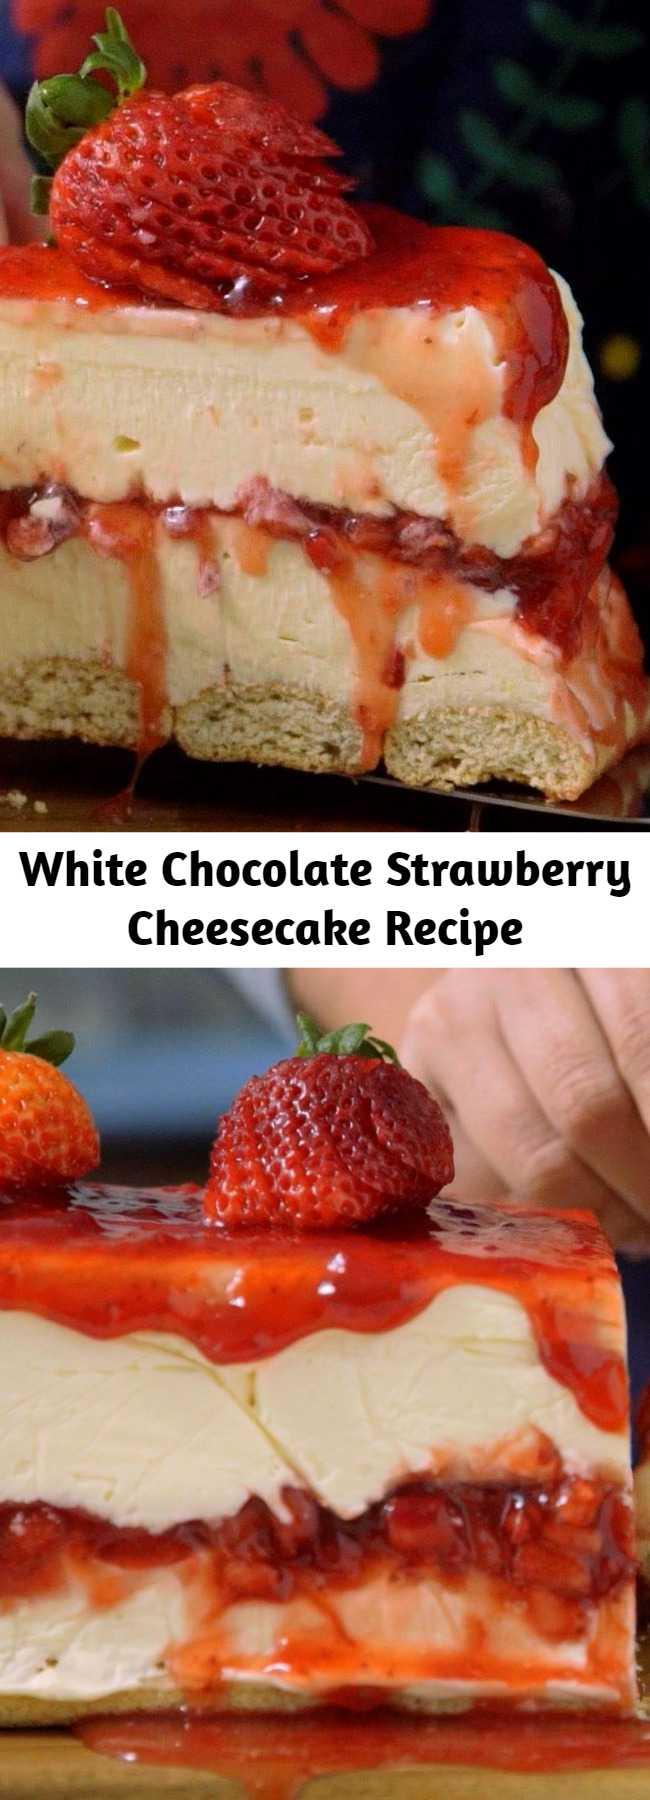 White Chocolate Strawberry Cheesecake Recipe - Creamy white chocolate makes a classic strawberry dessert even more irresistible.